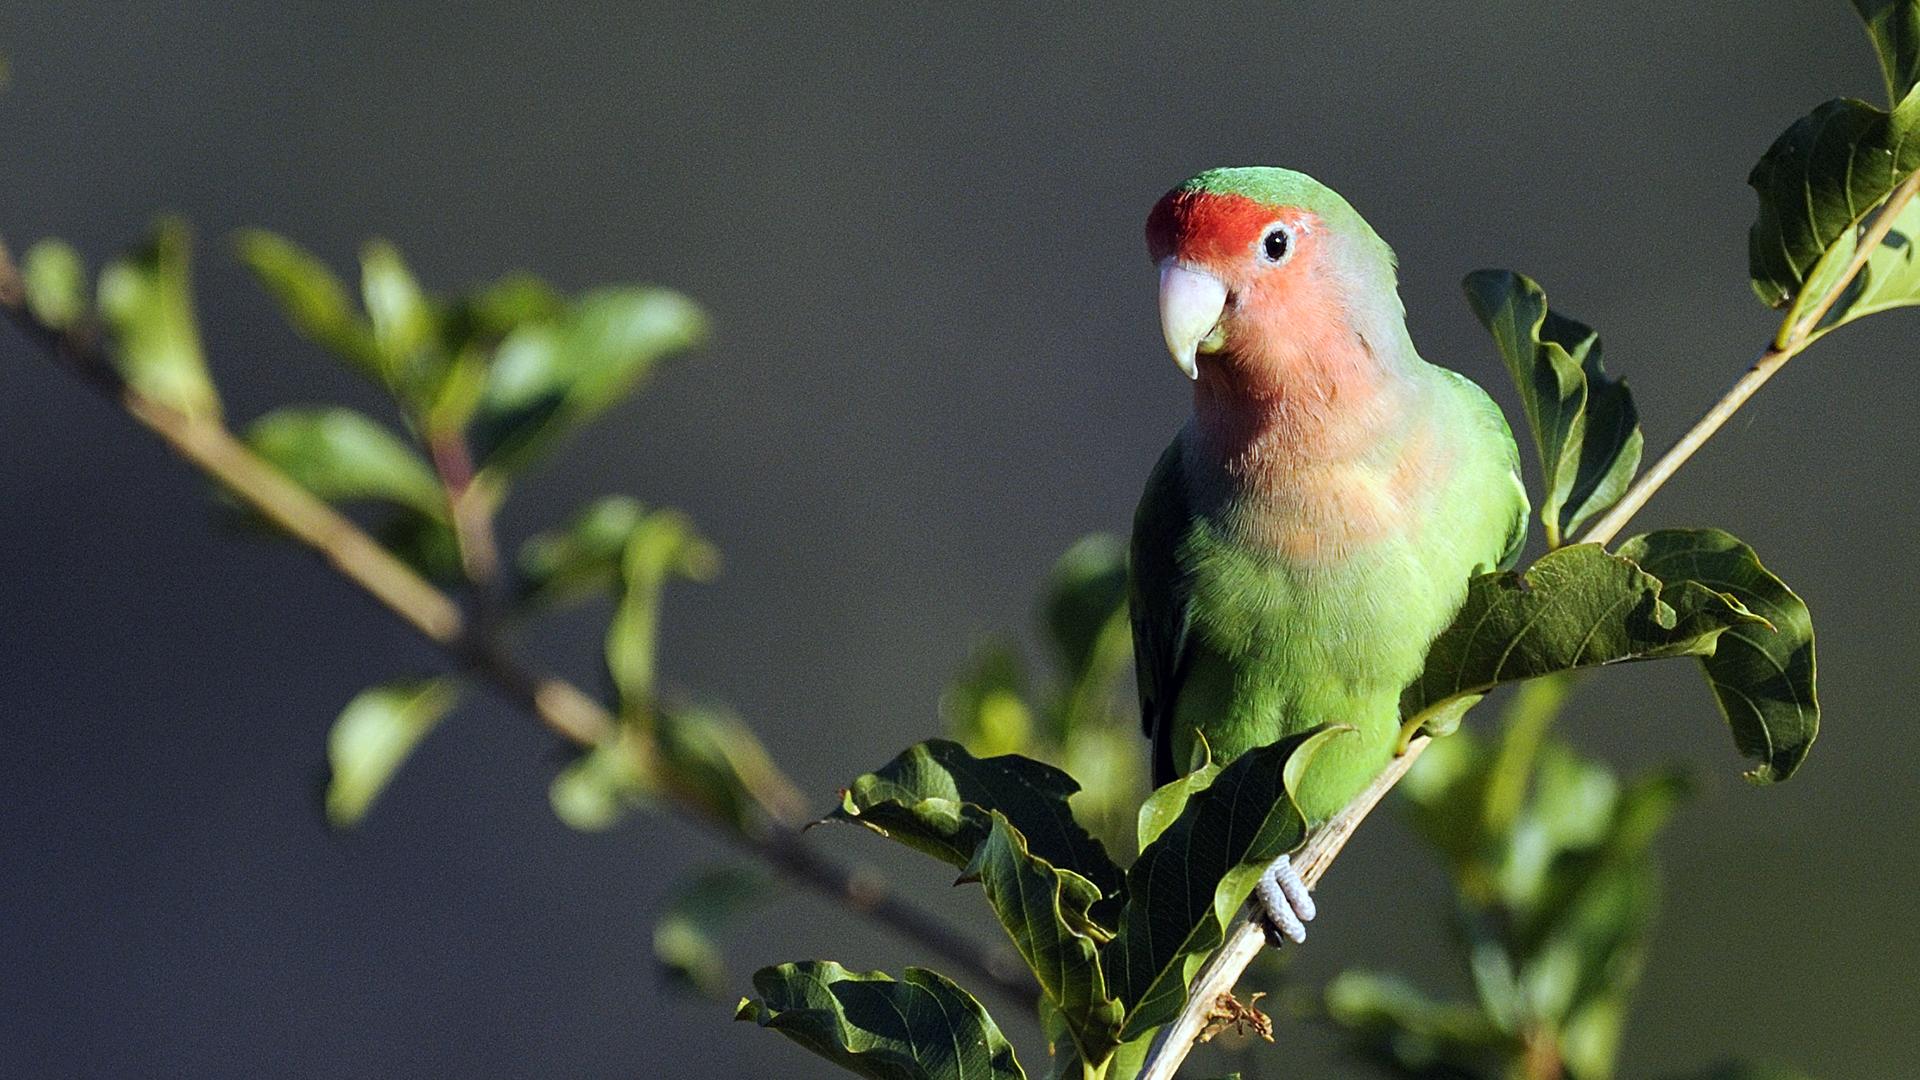 Lovebird Suara Gacor Disukai Penggemar Burung Kicau